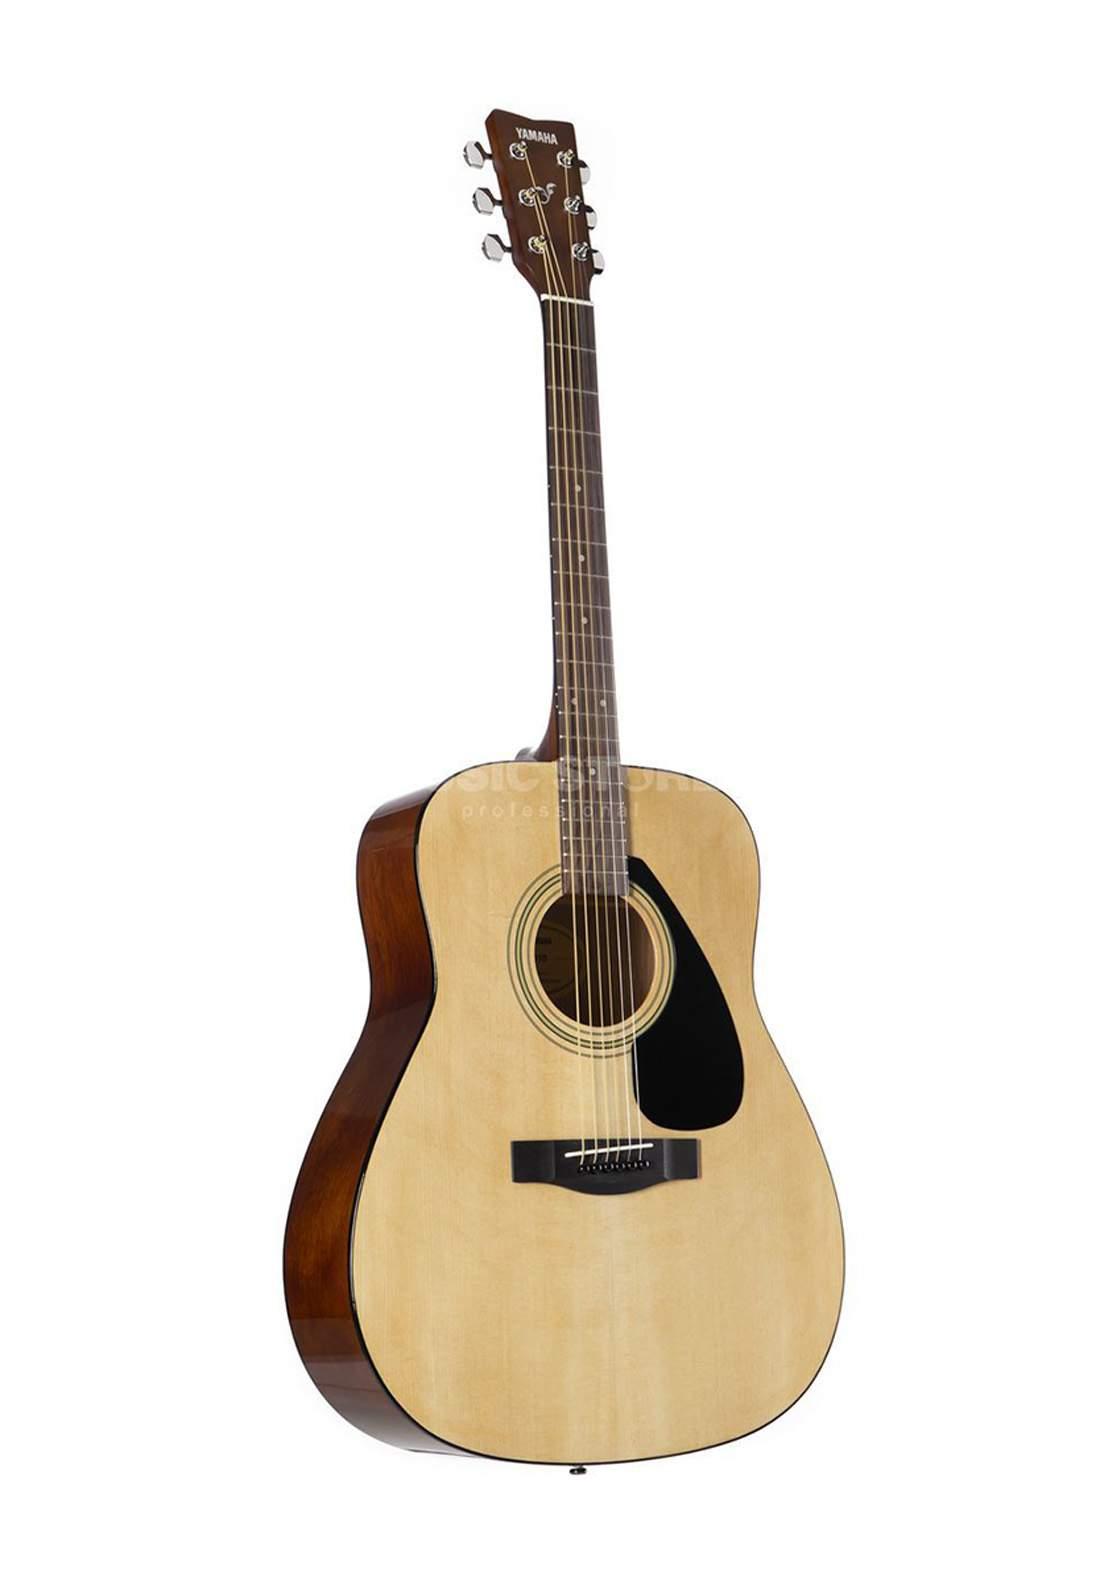 Yamaha Acoustic Guitar اكوستك جيتار